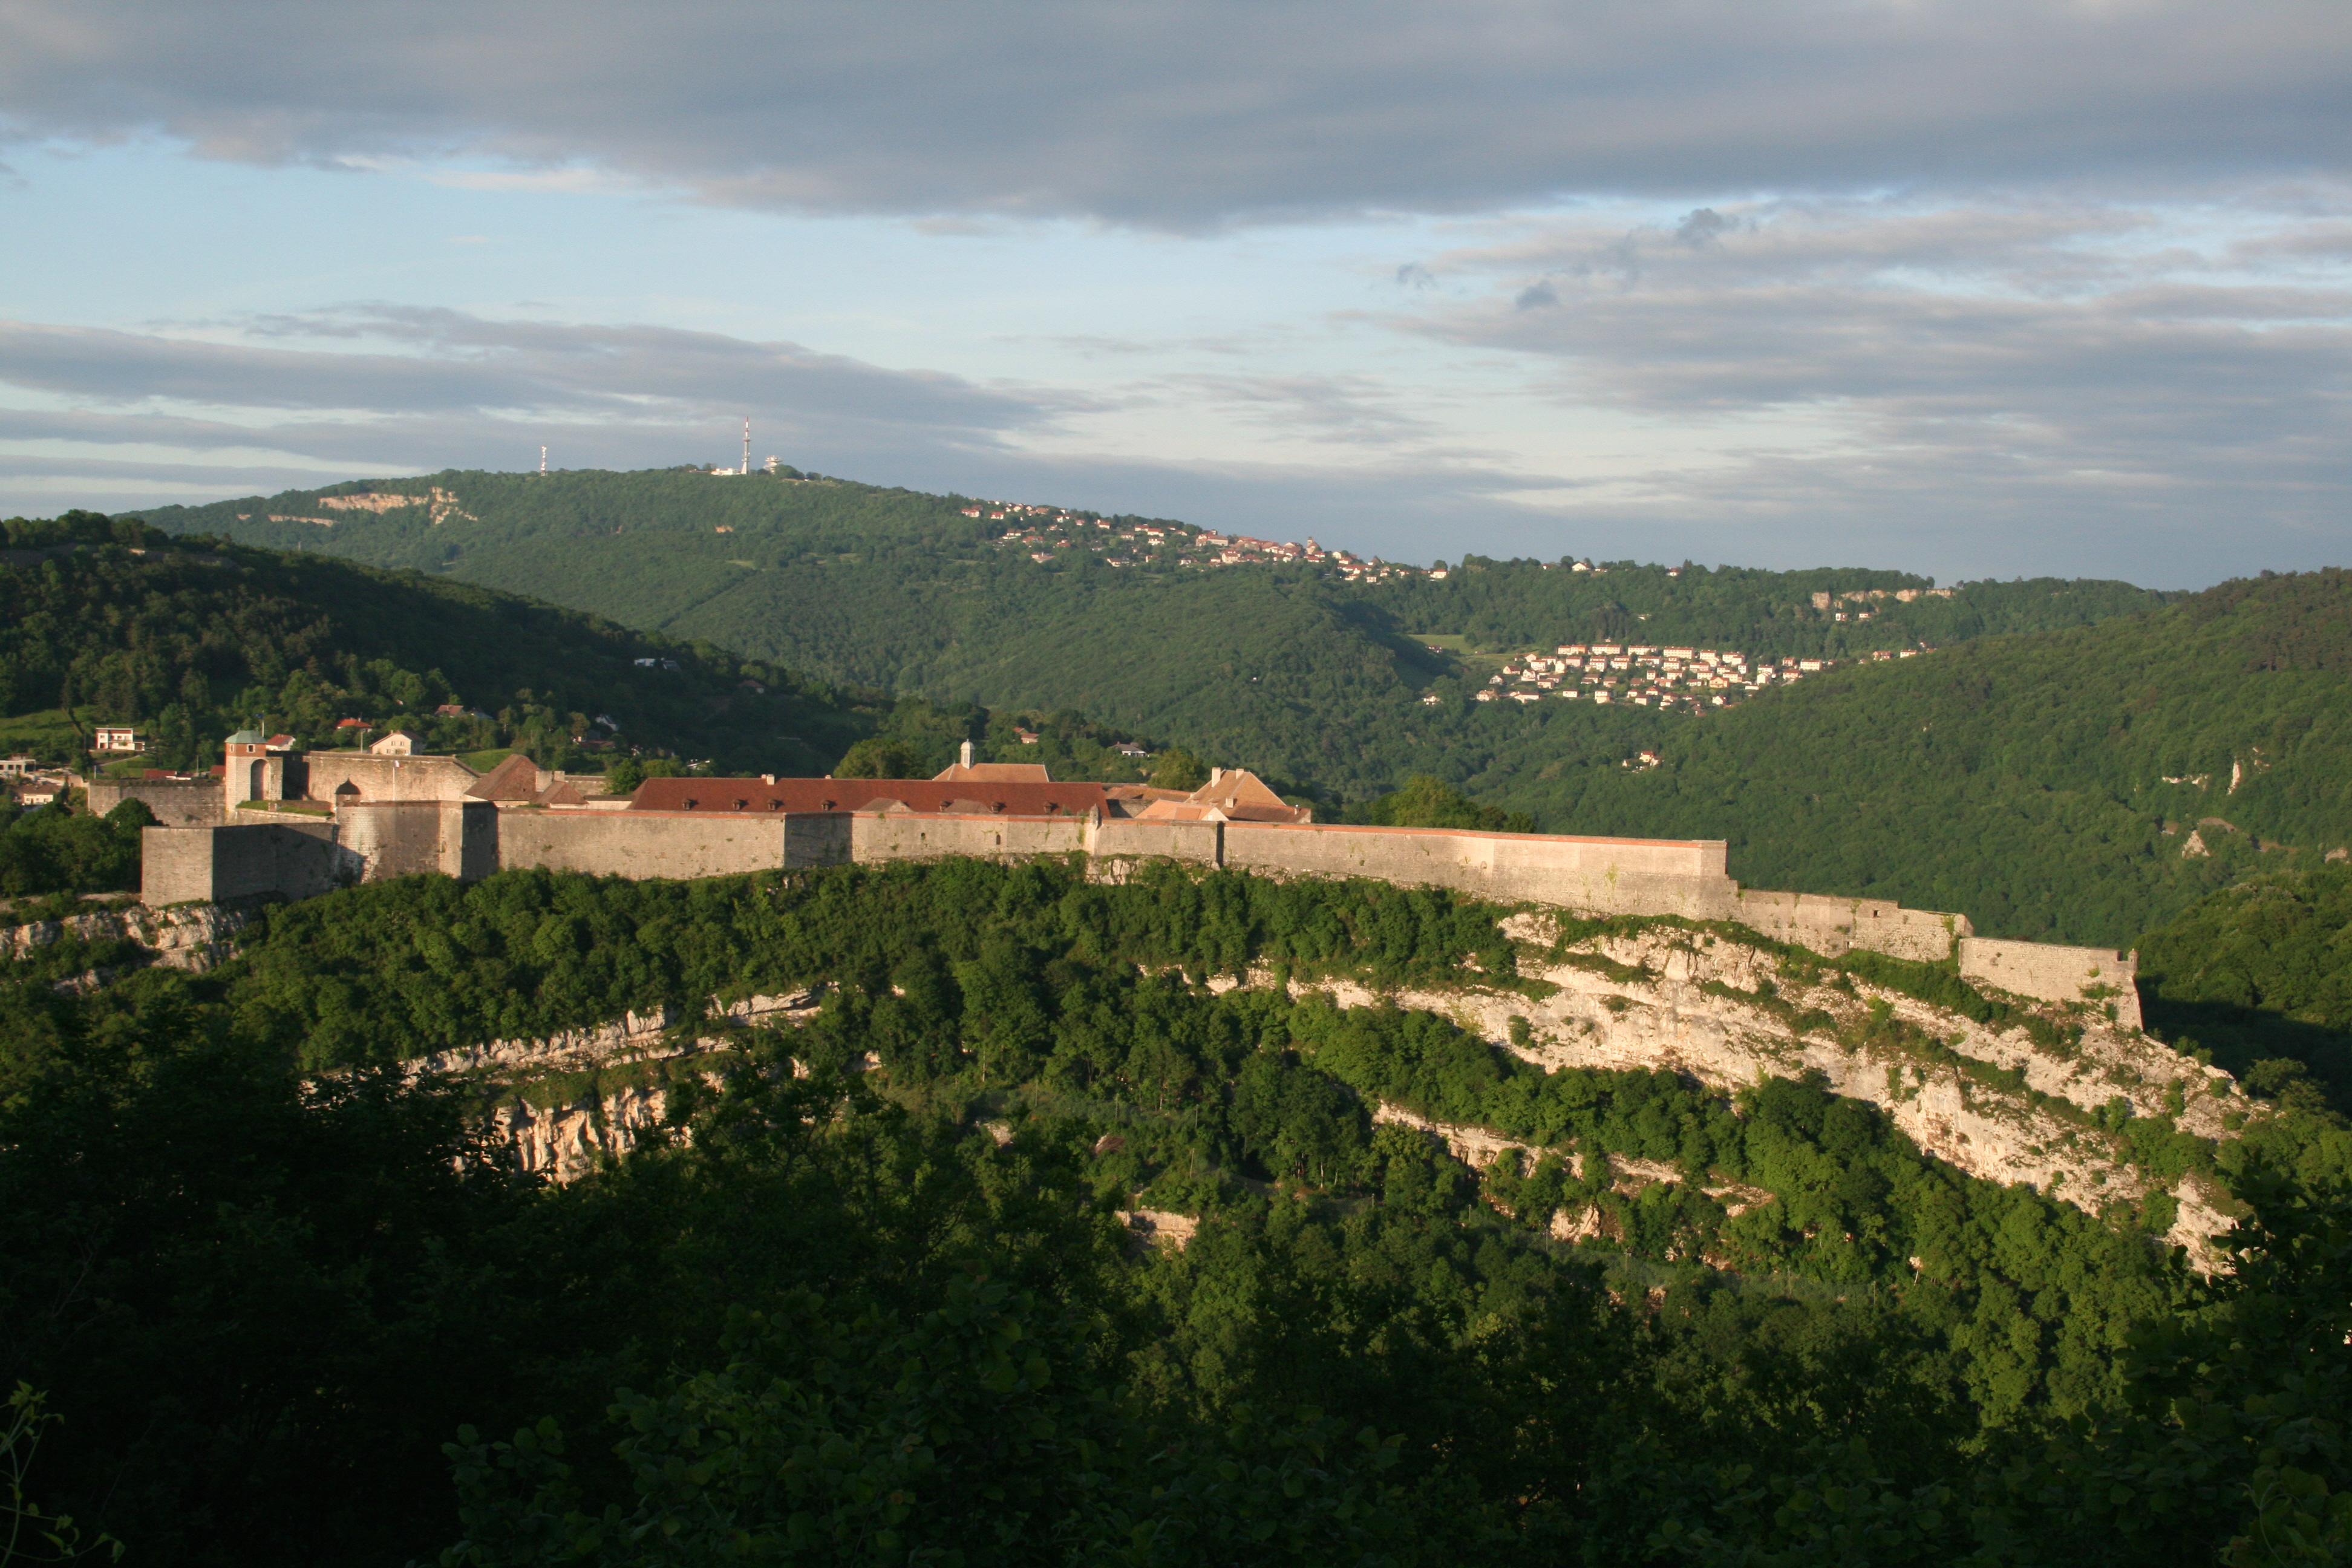 File:0 Besancon - Citadelle (1).jpg - Wikipedia, the free ...